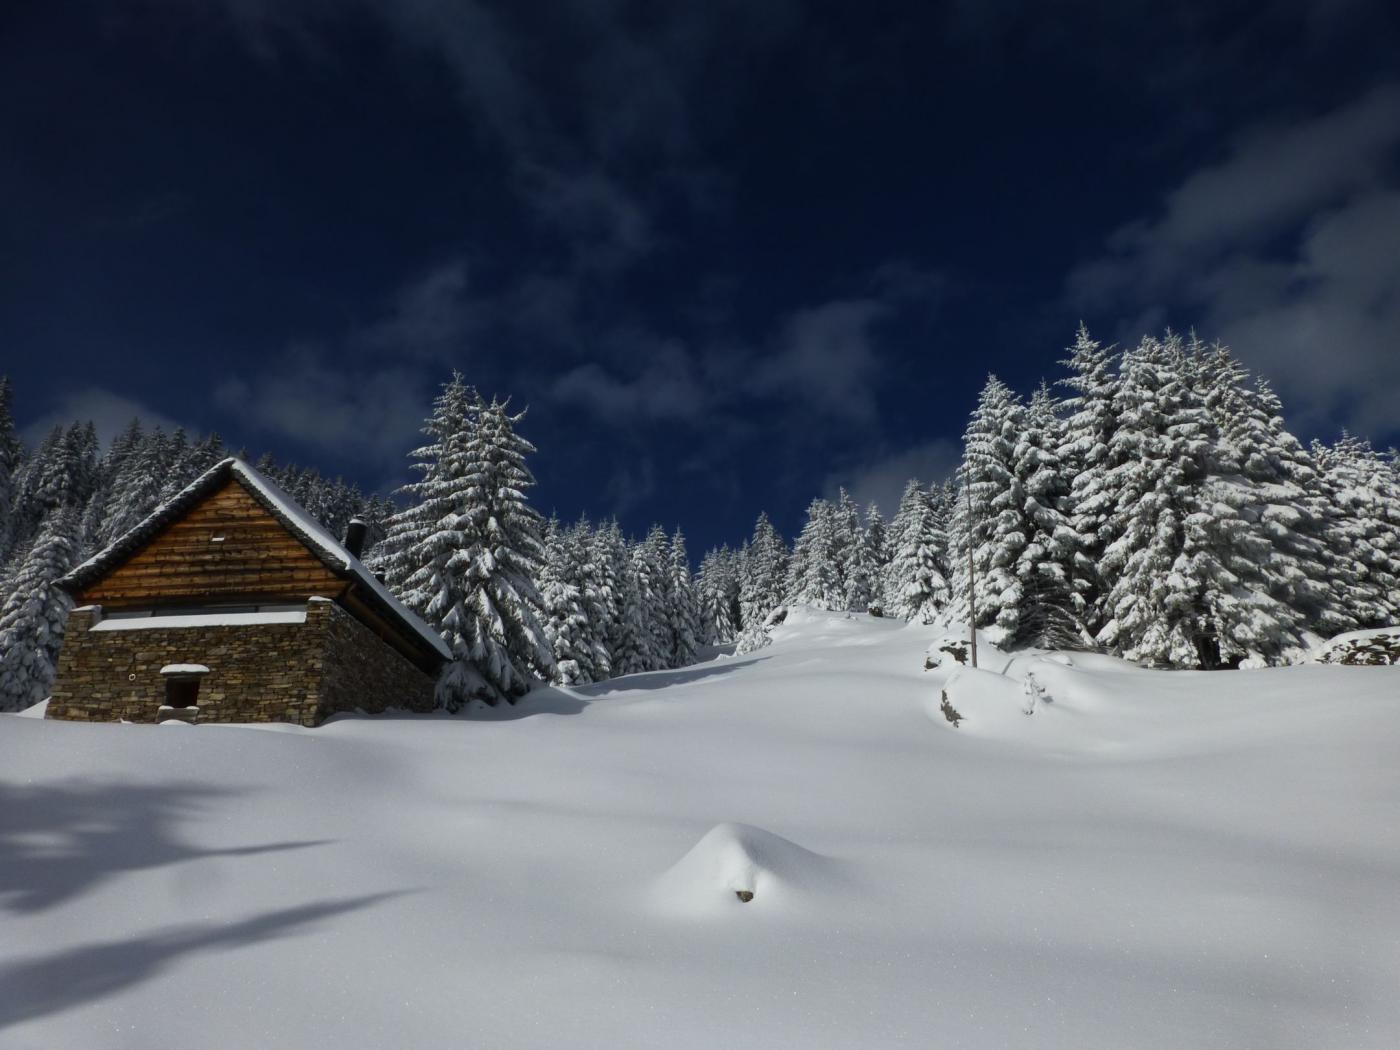 Cielo blu su neve vergine